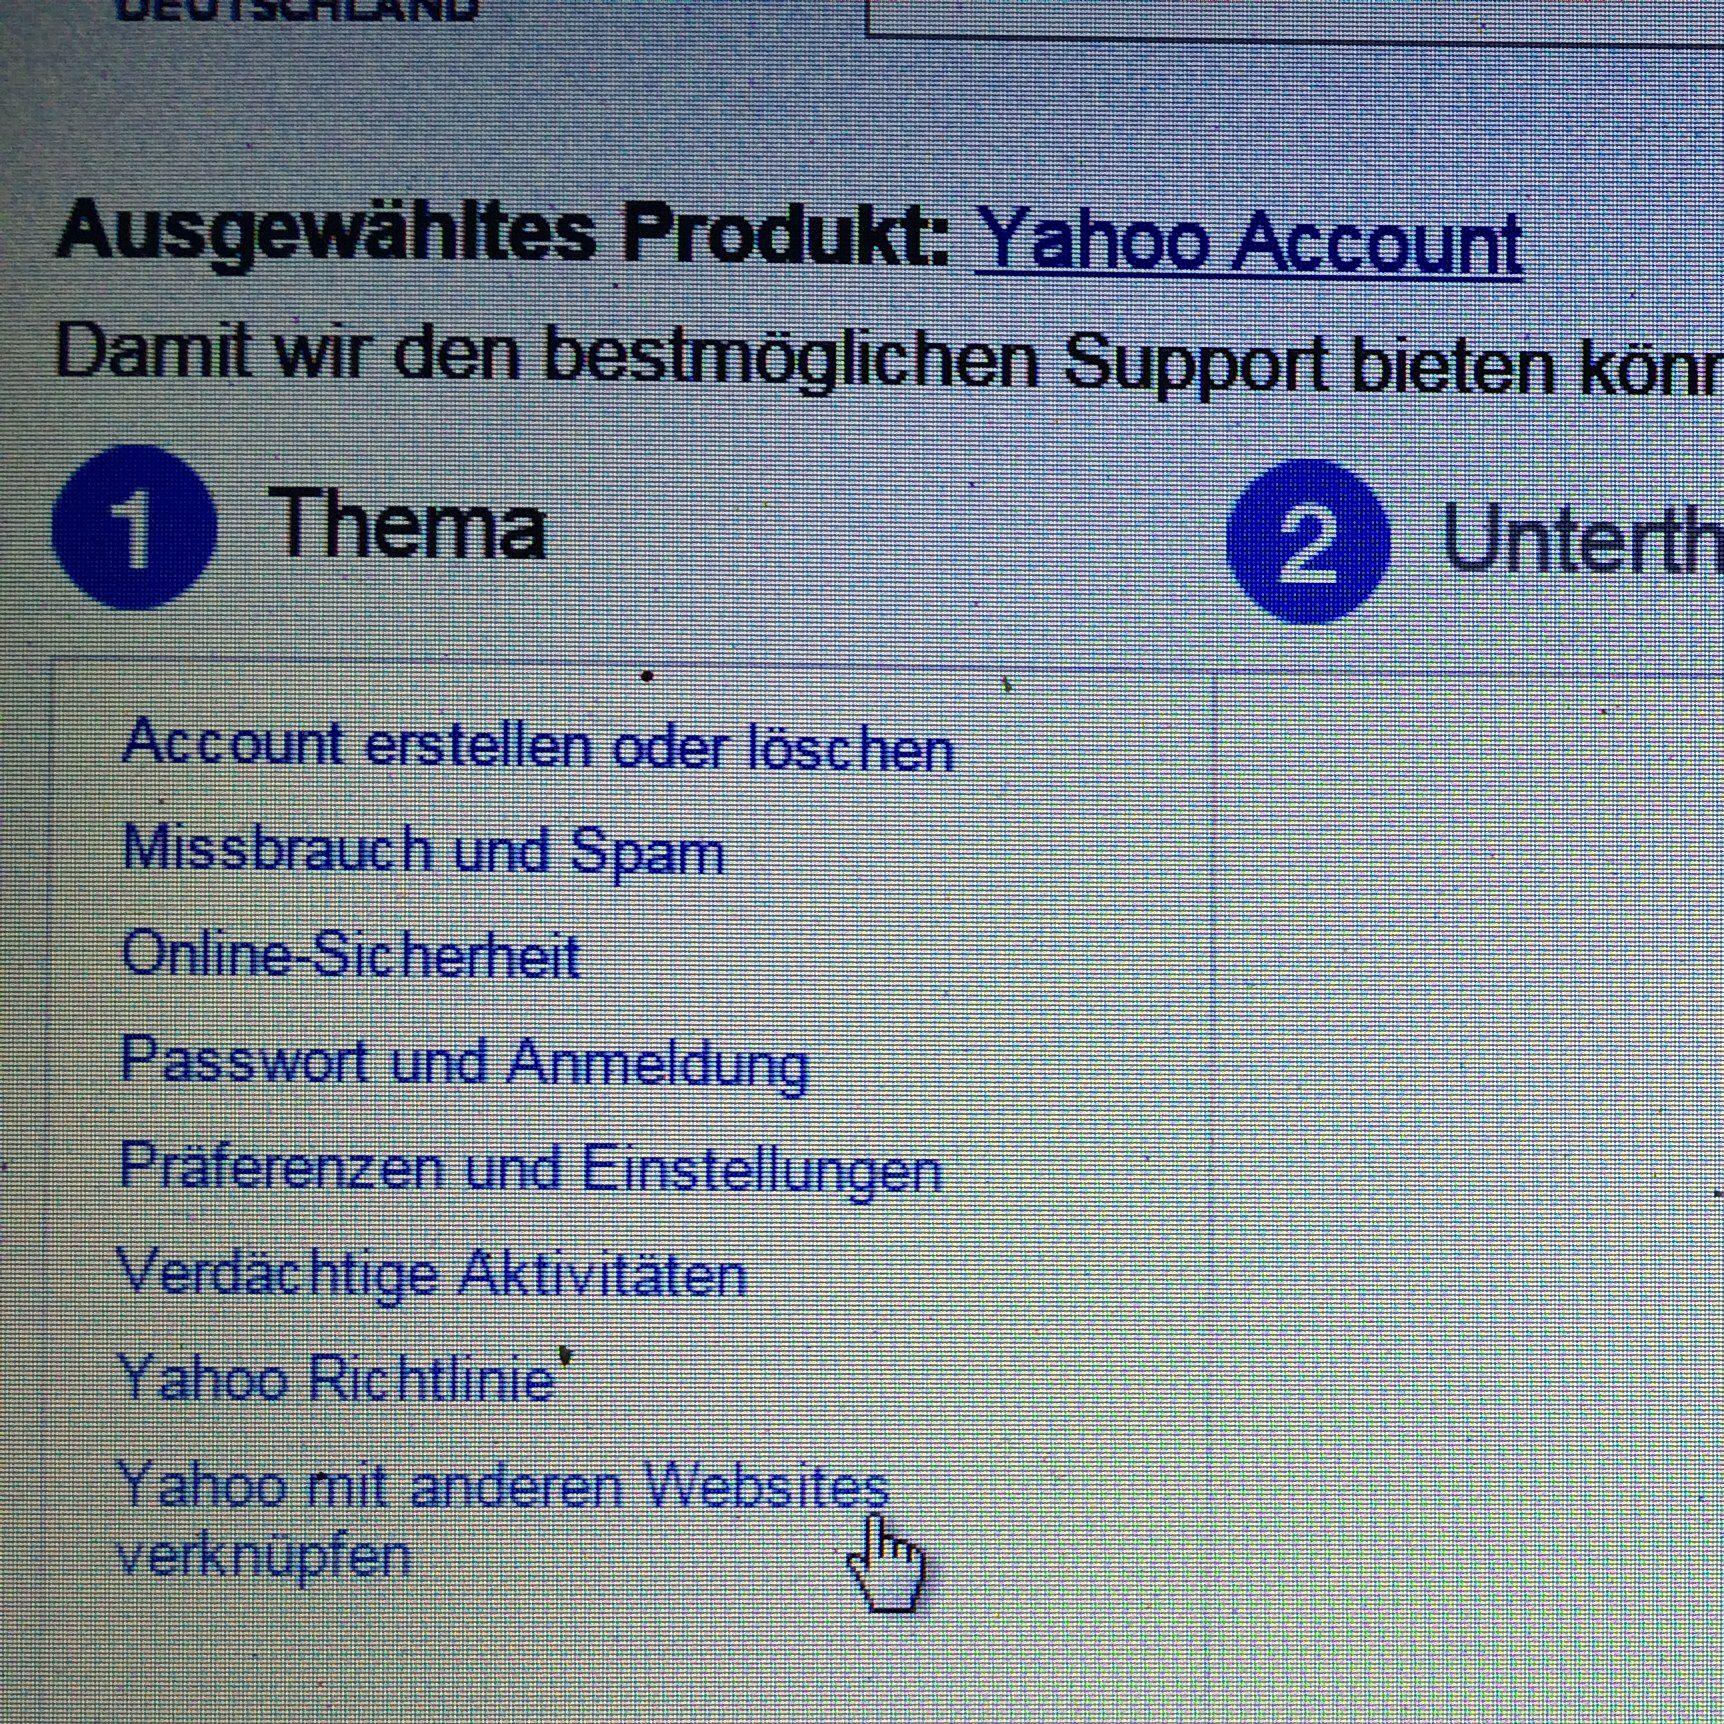 Wie kontaktiere ich den yahoo Support? (konto-gesperrt)